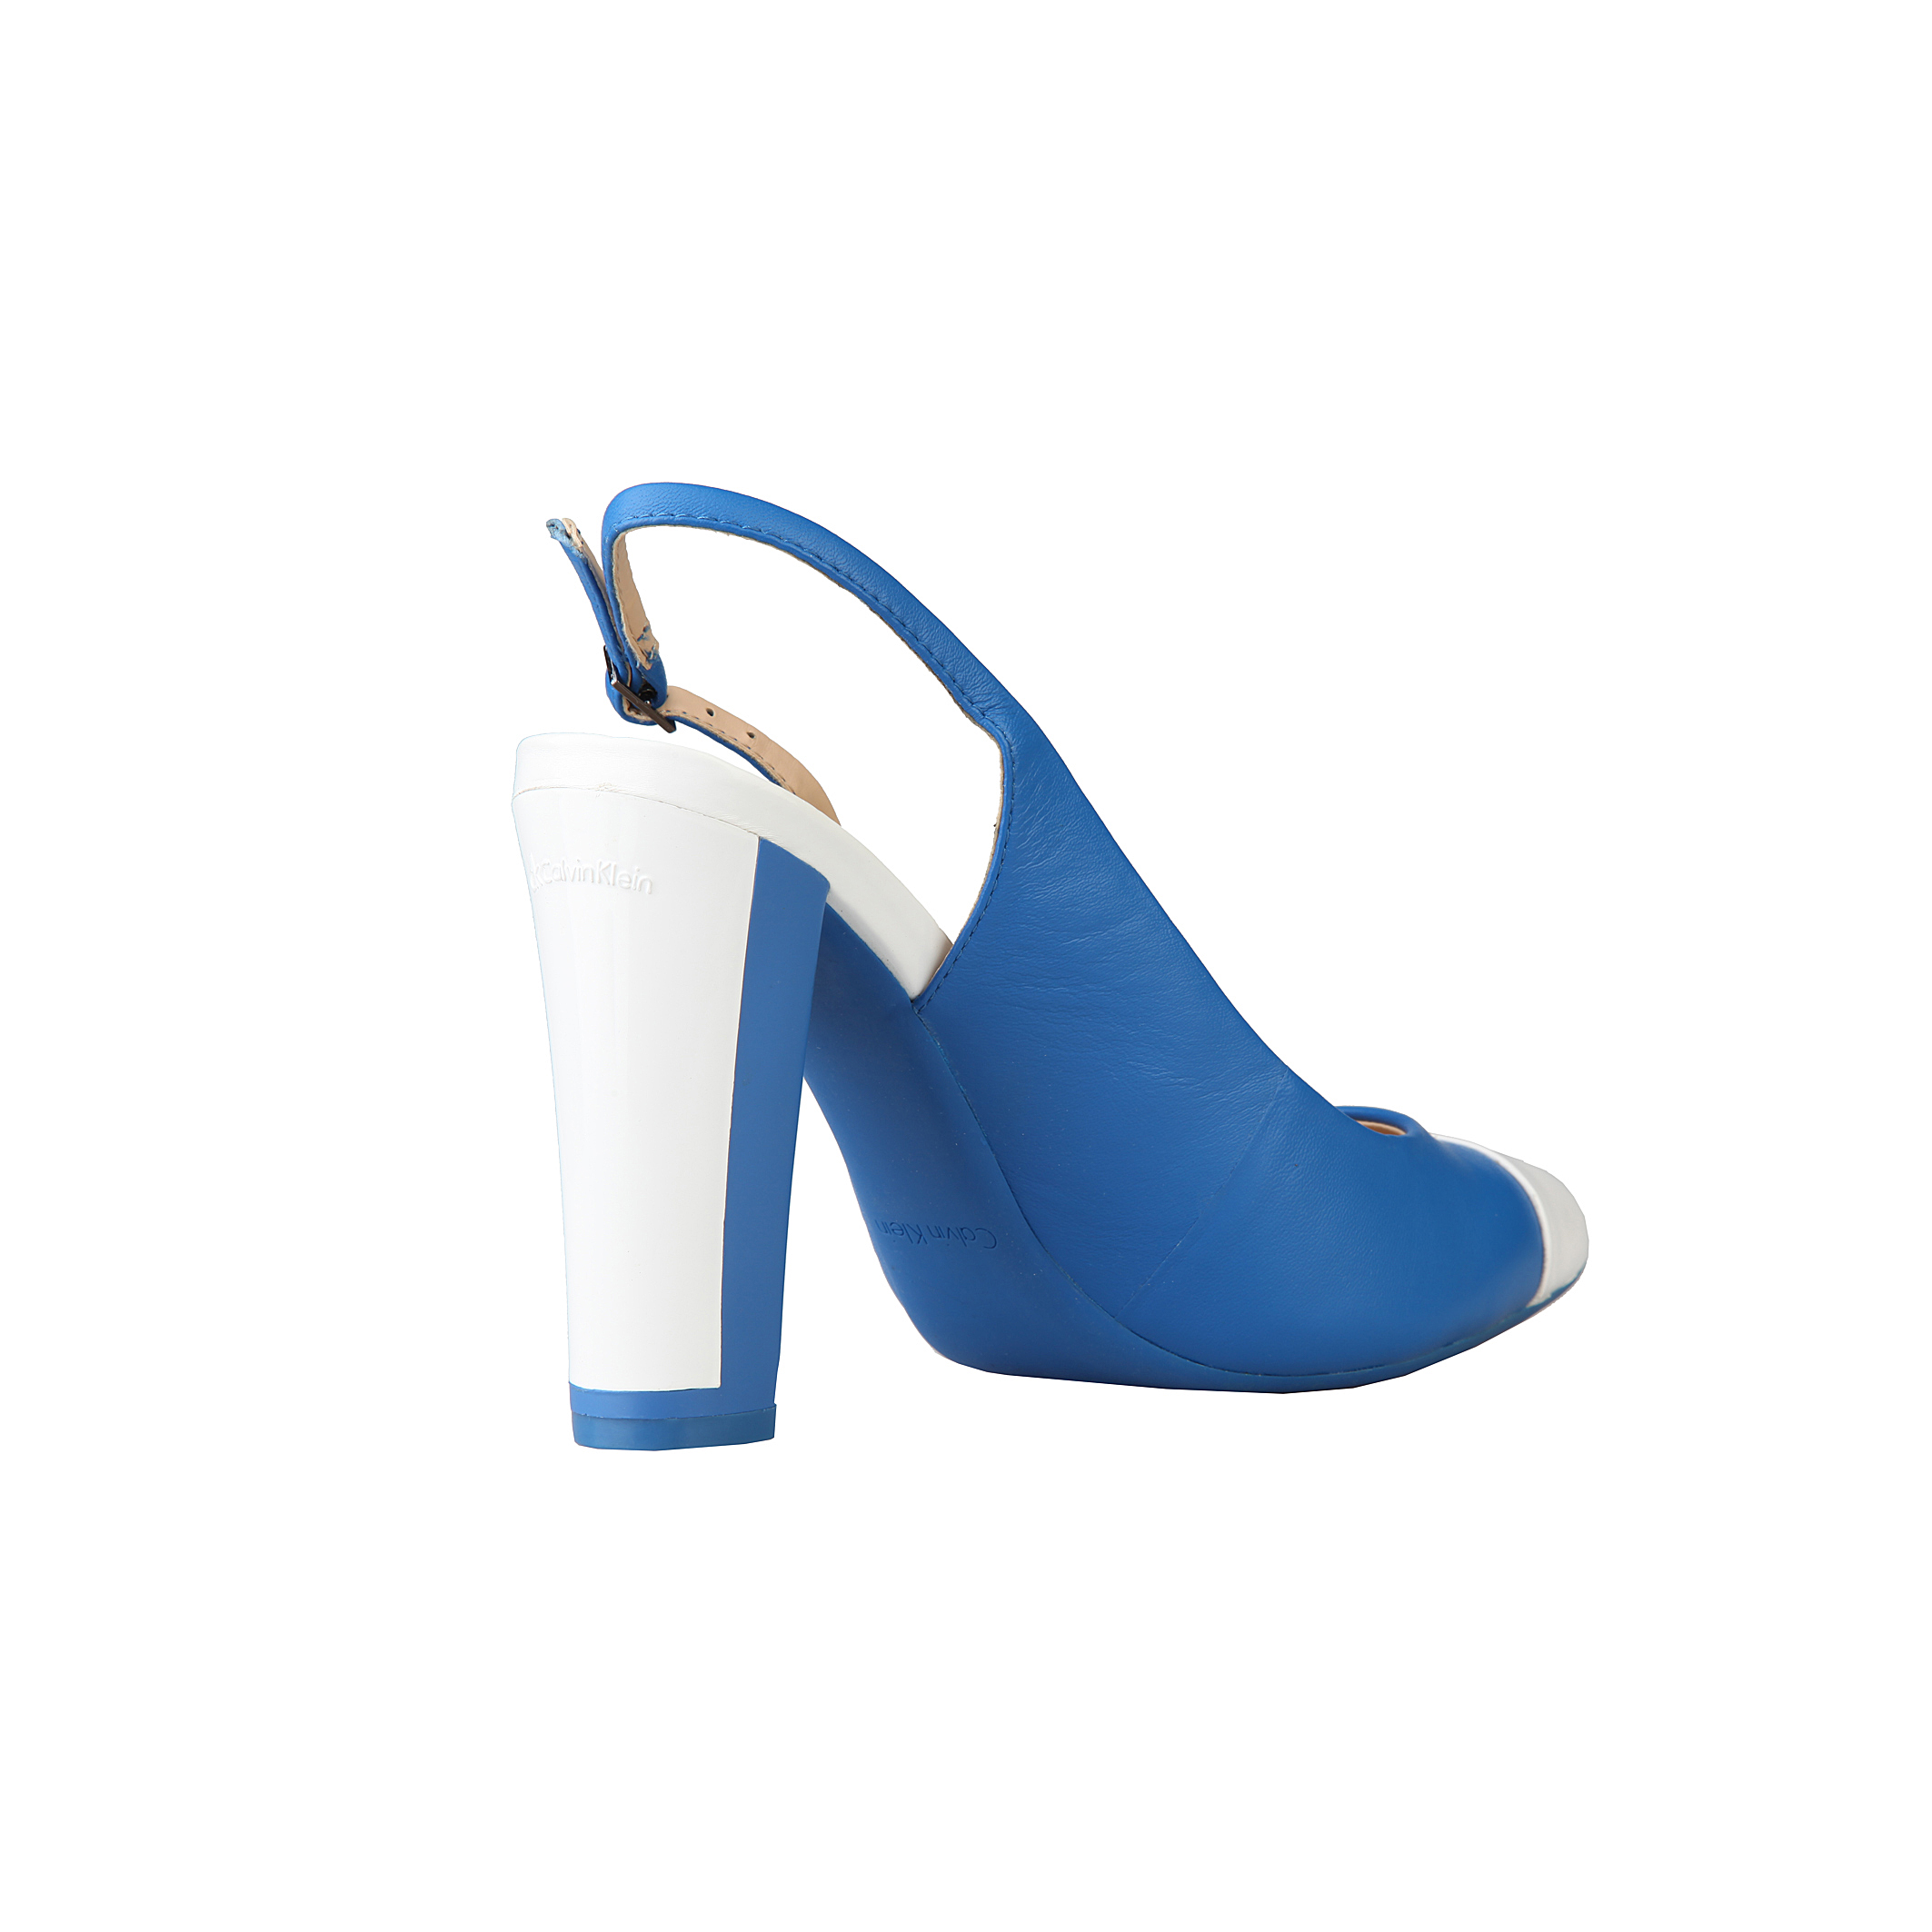 Sandali-Calvin-Klein-N11364-Donna-Blu-59326 miniatura 3